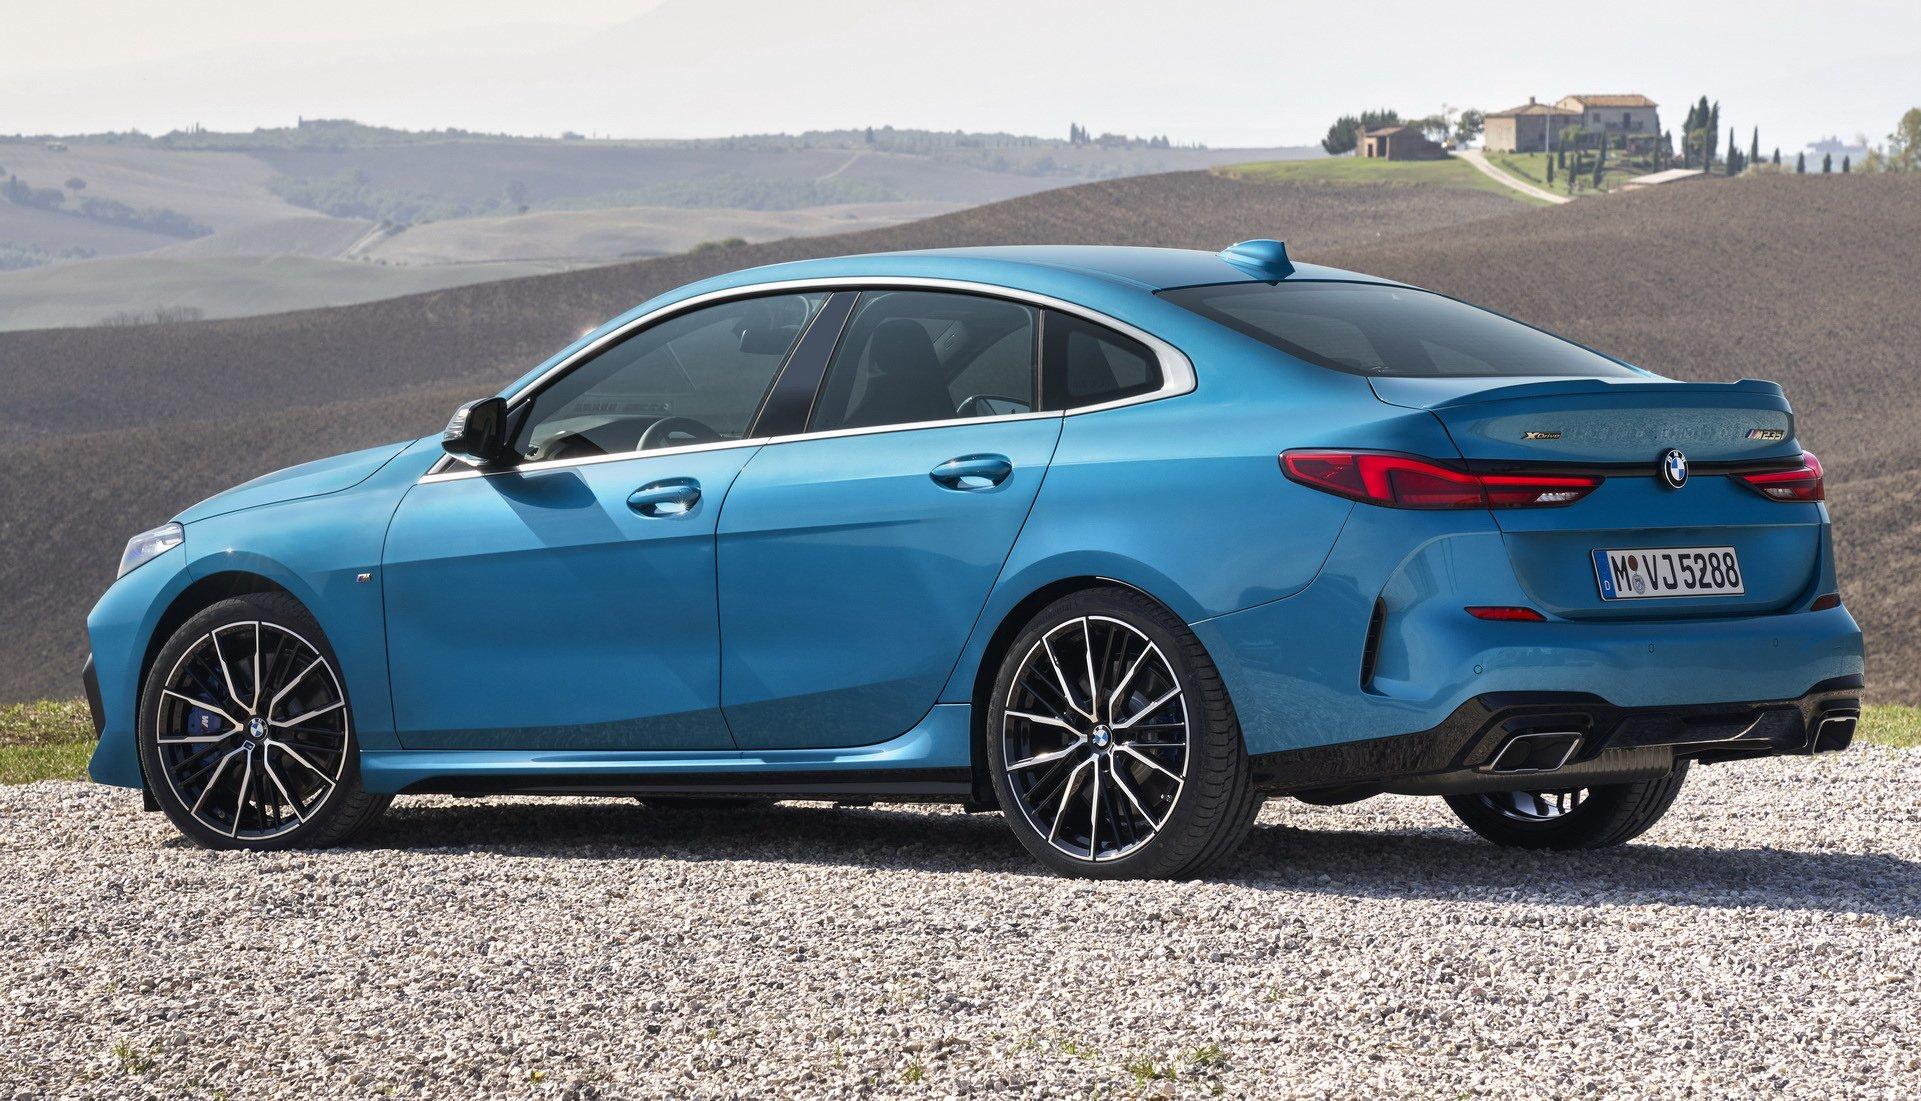 2020-bmw-2-series-gran-coupe-3.jpg